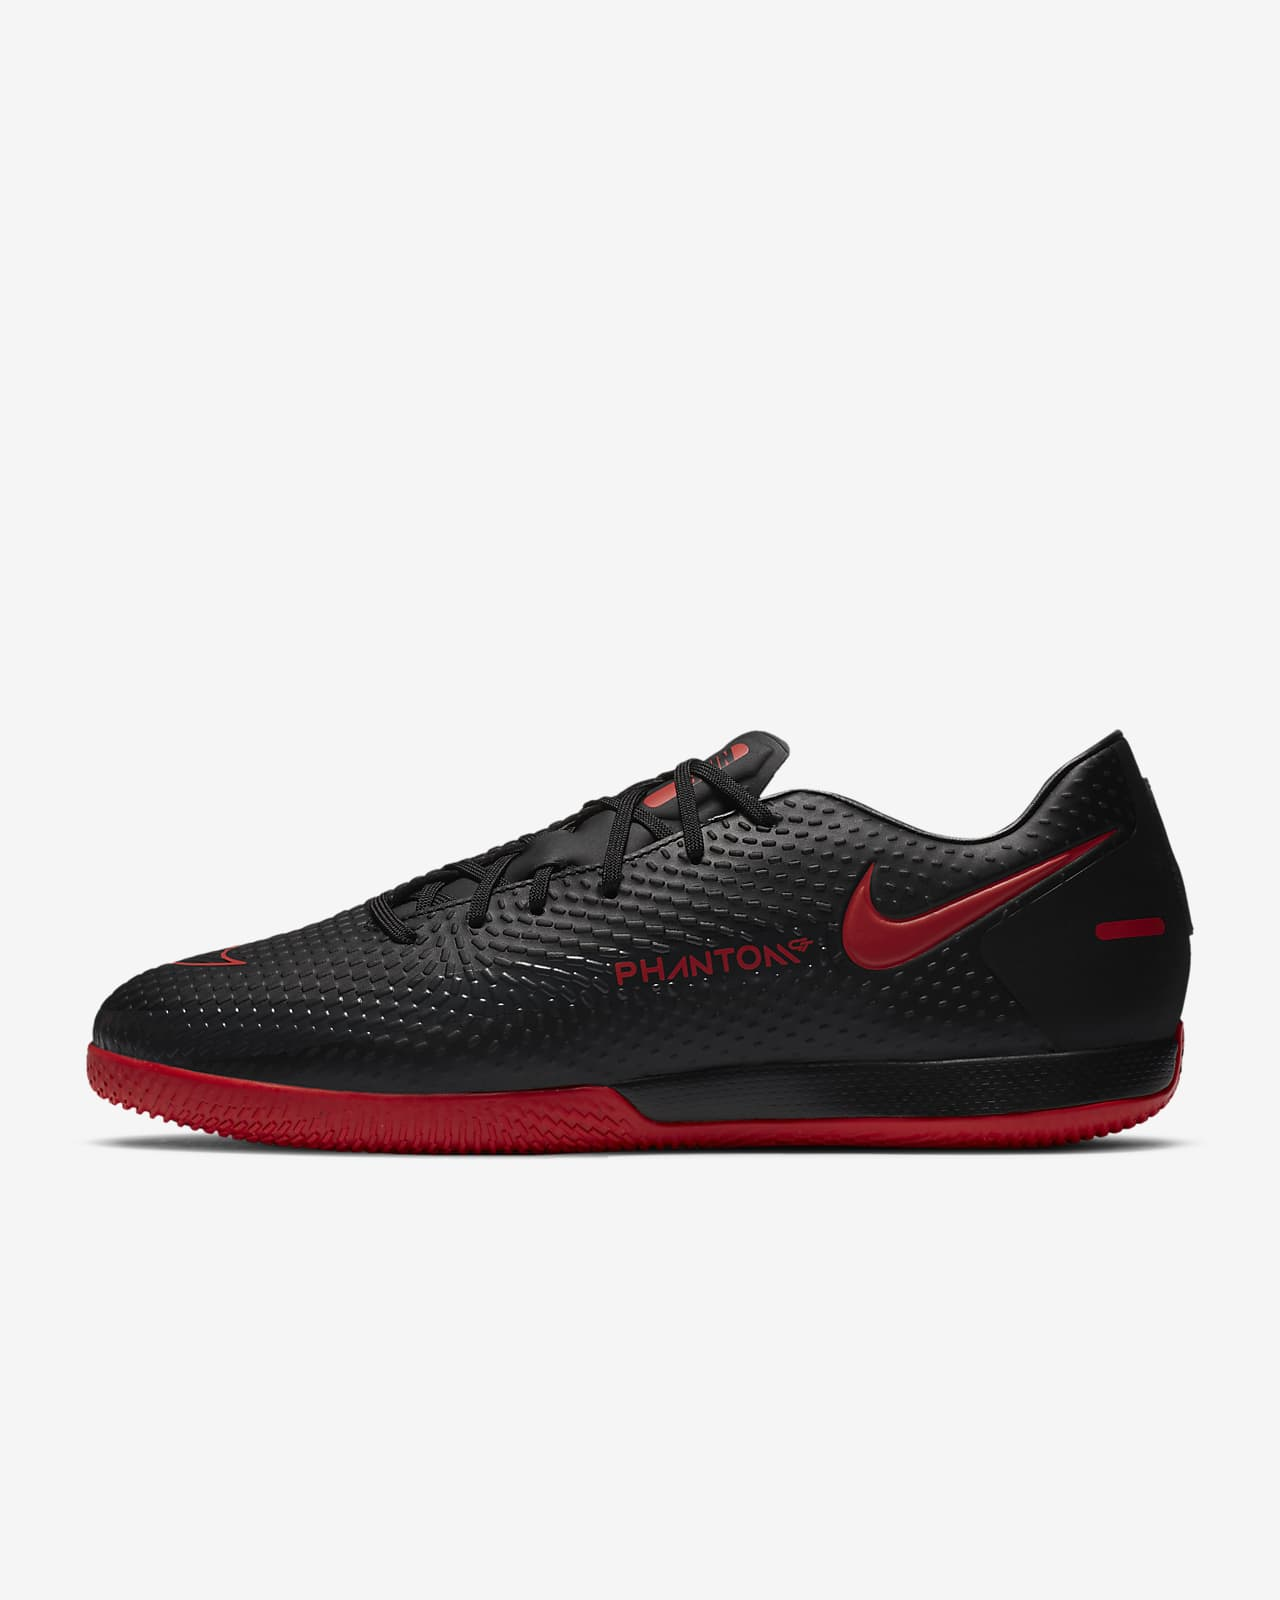 Nike Phantom GT Academy IC Indoor/Court